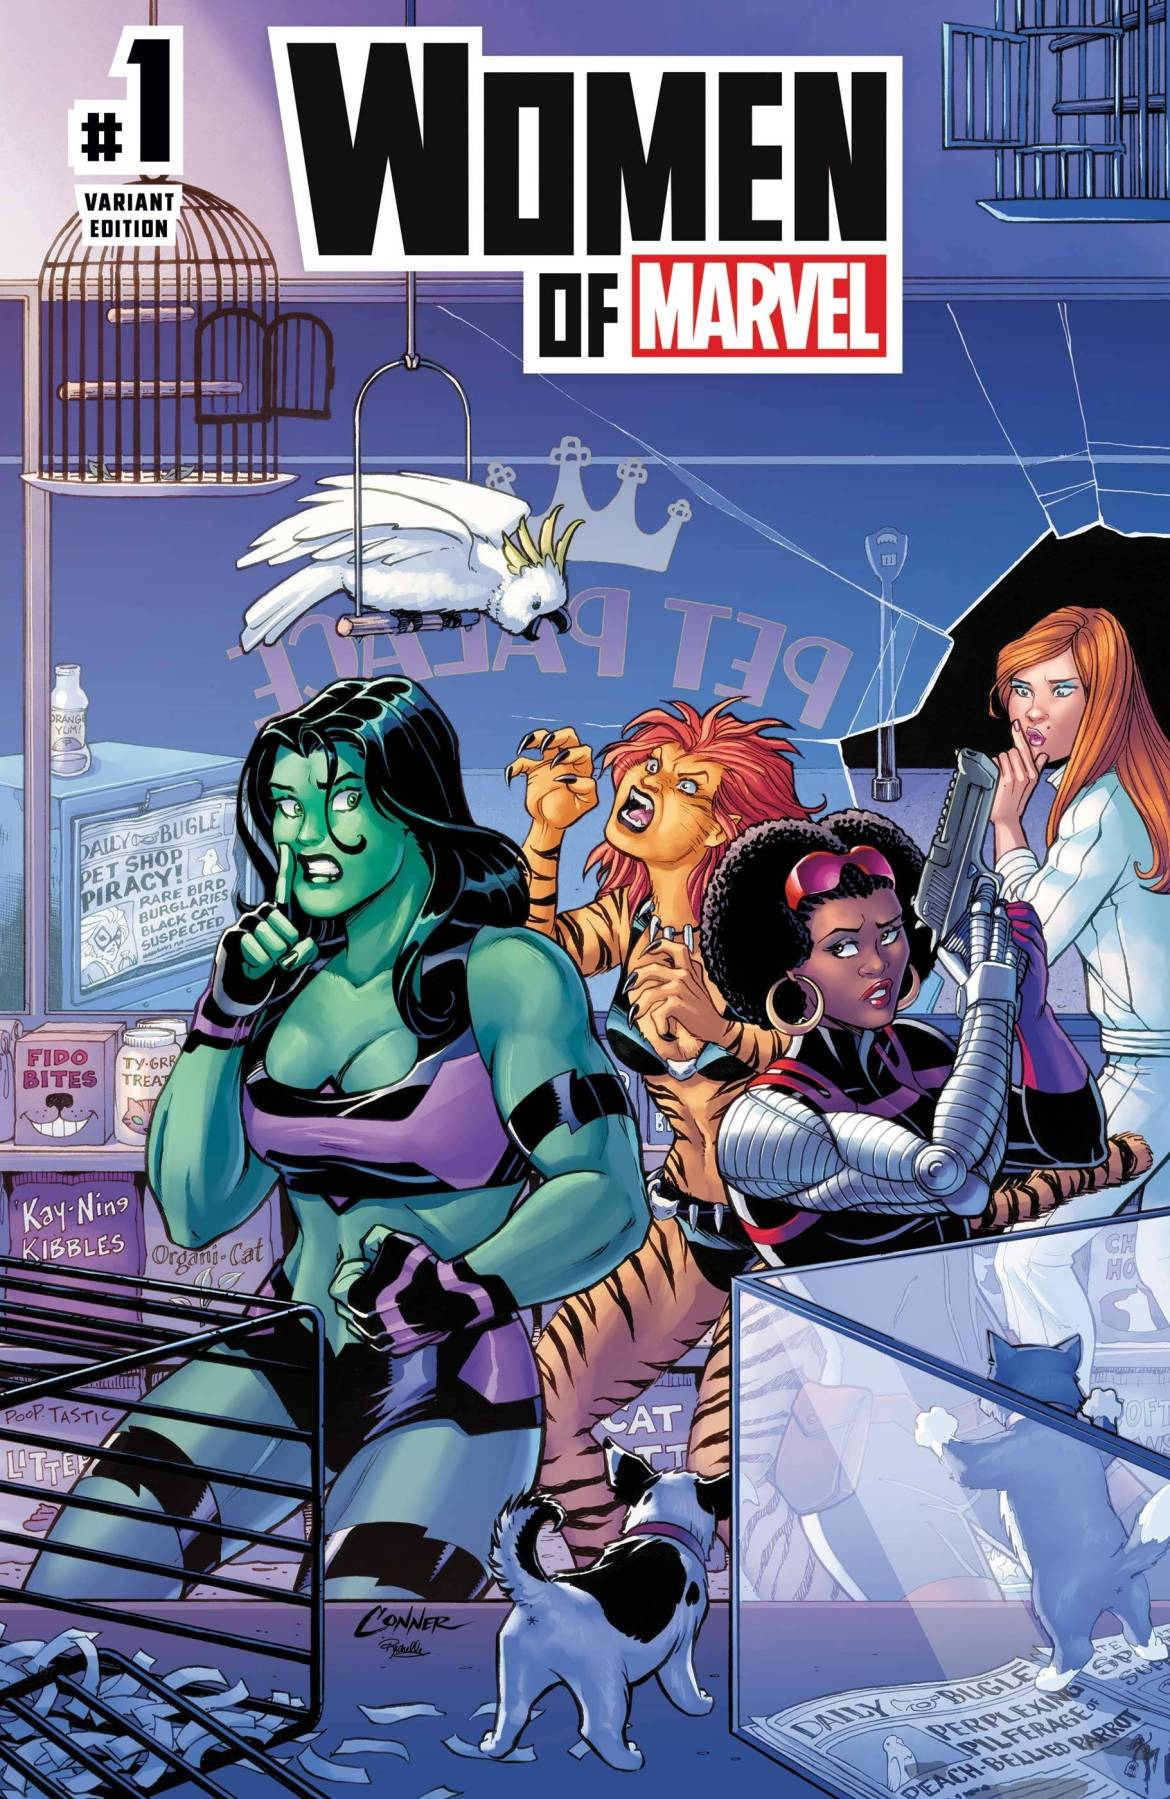 STL182296 ComicList: Marvel Comics New Releases for 04/21/2021